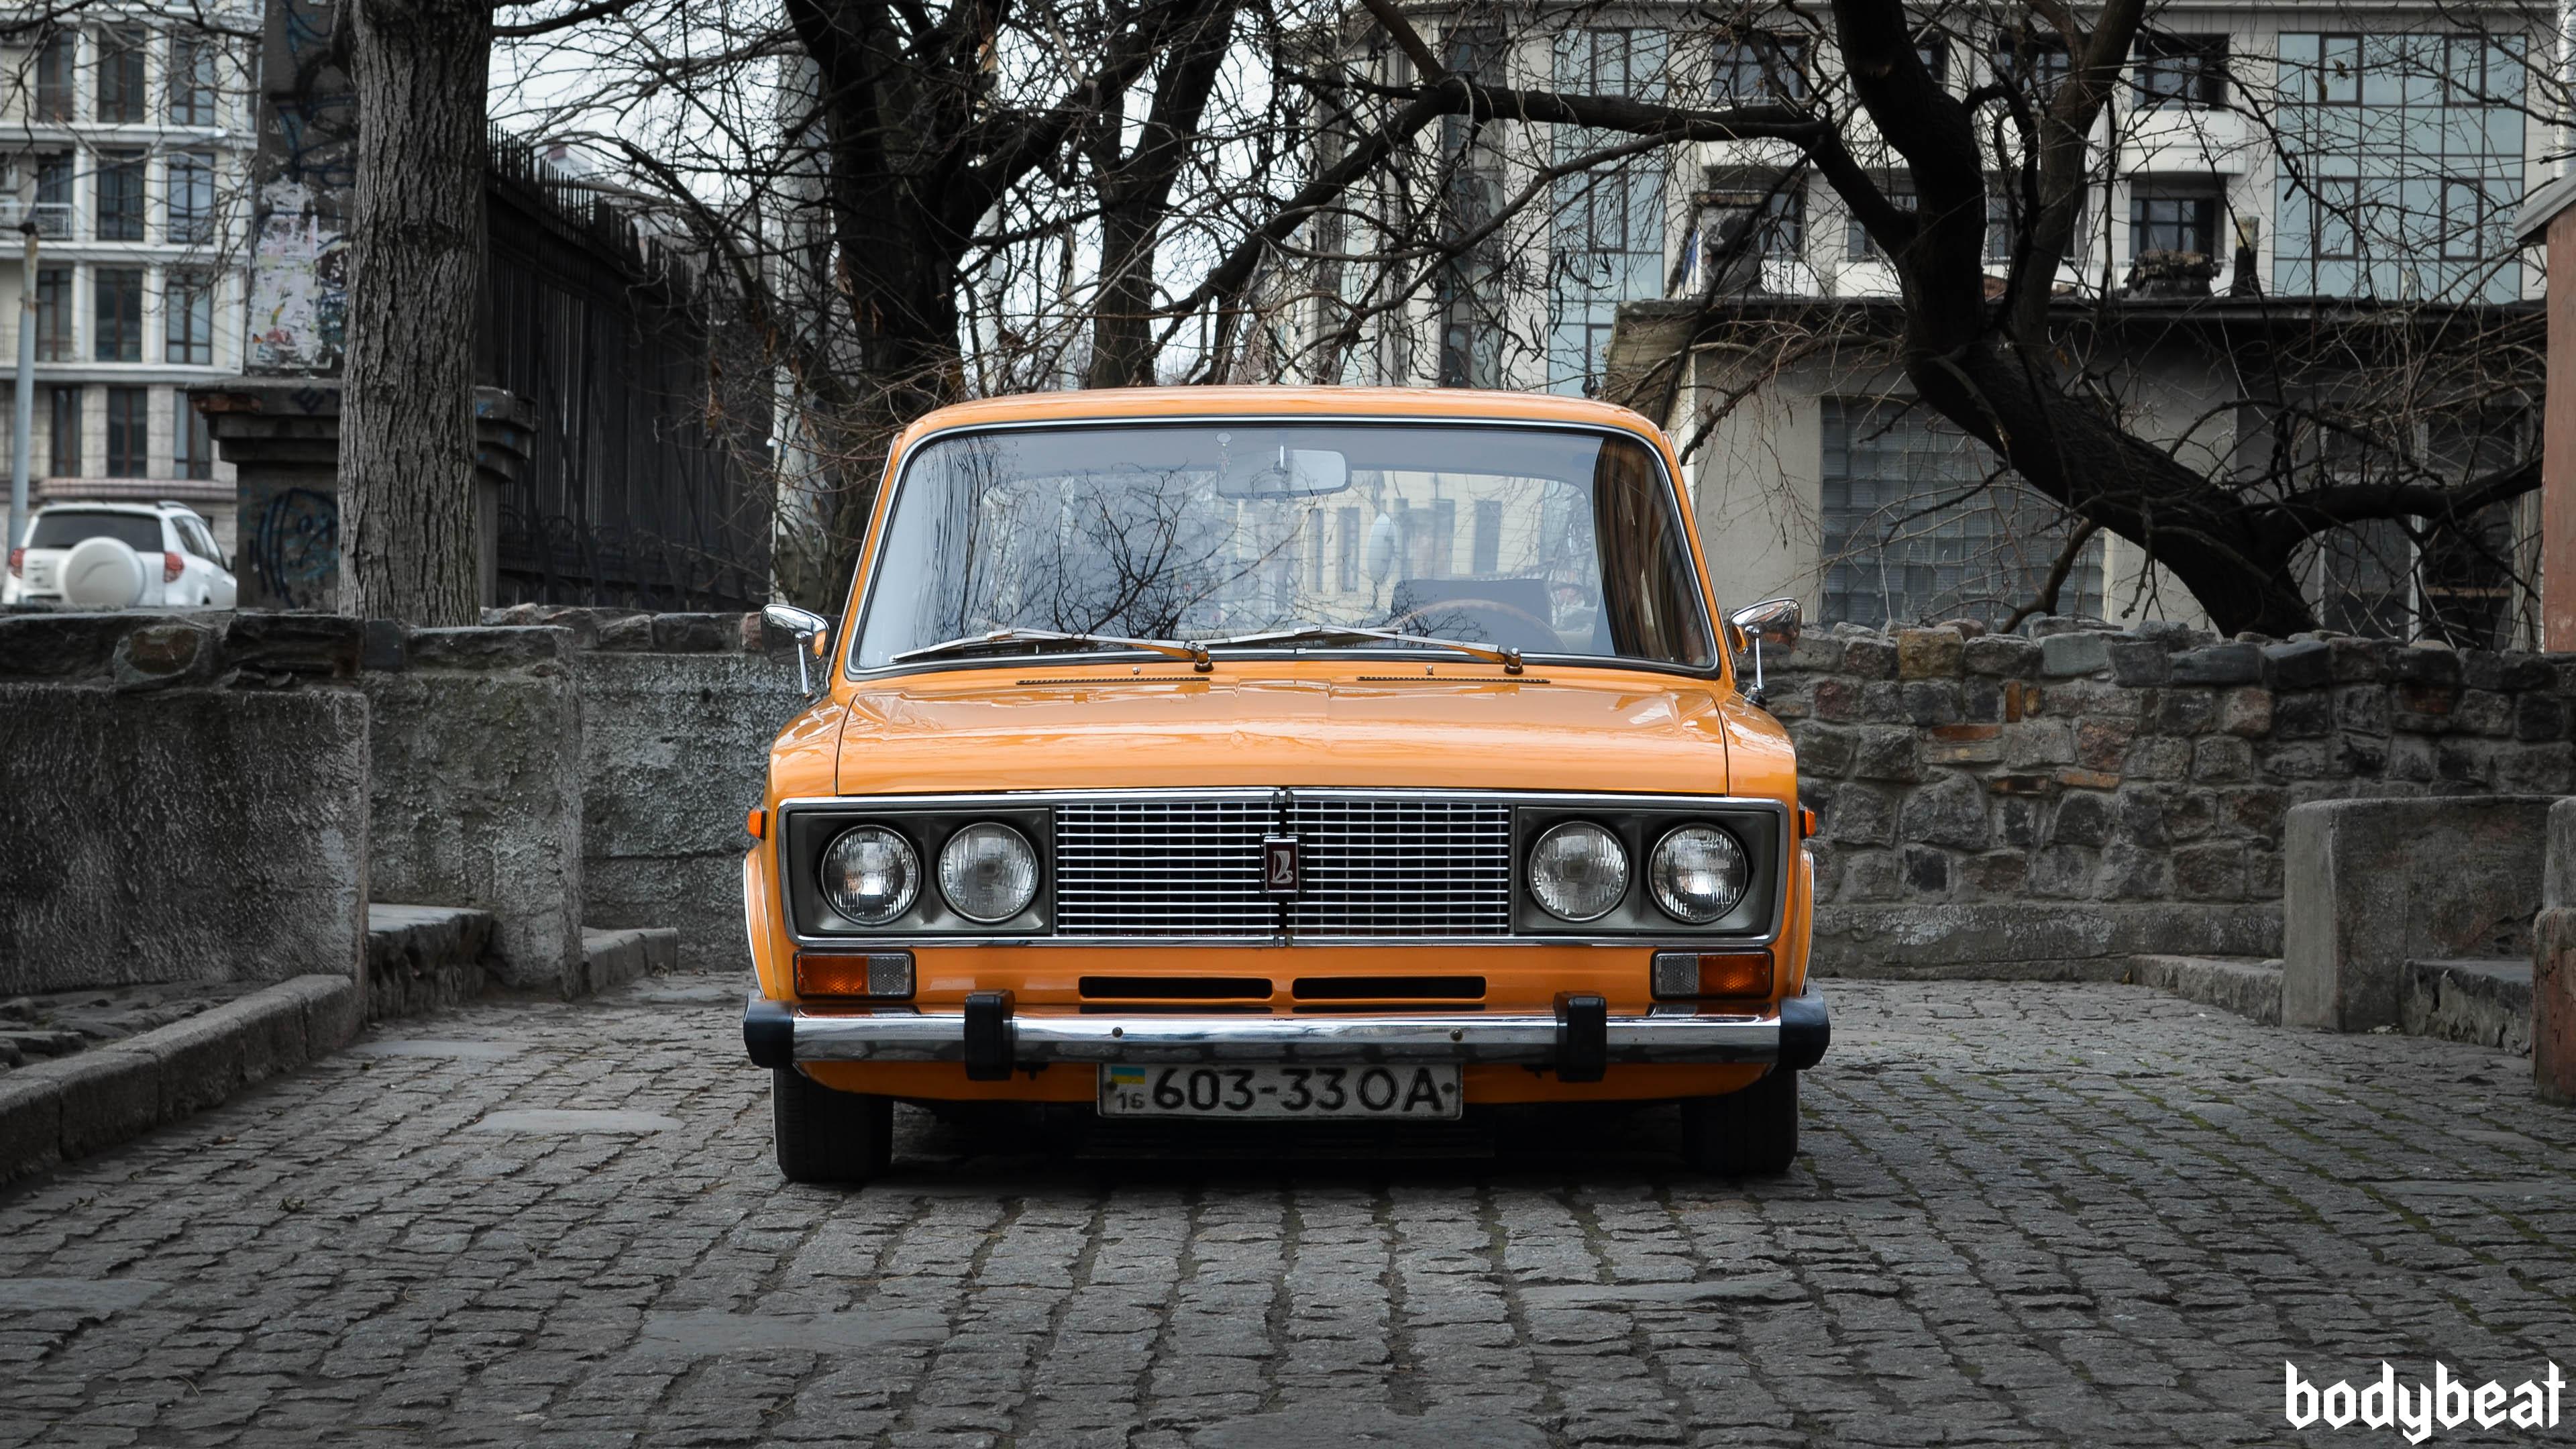 Наследство ВАЗ 2106 | Chechundra - Новости про автотехнику